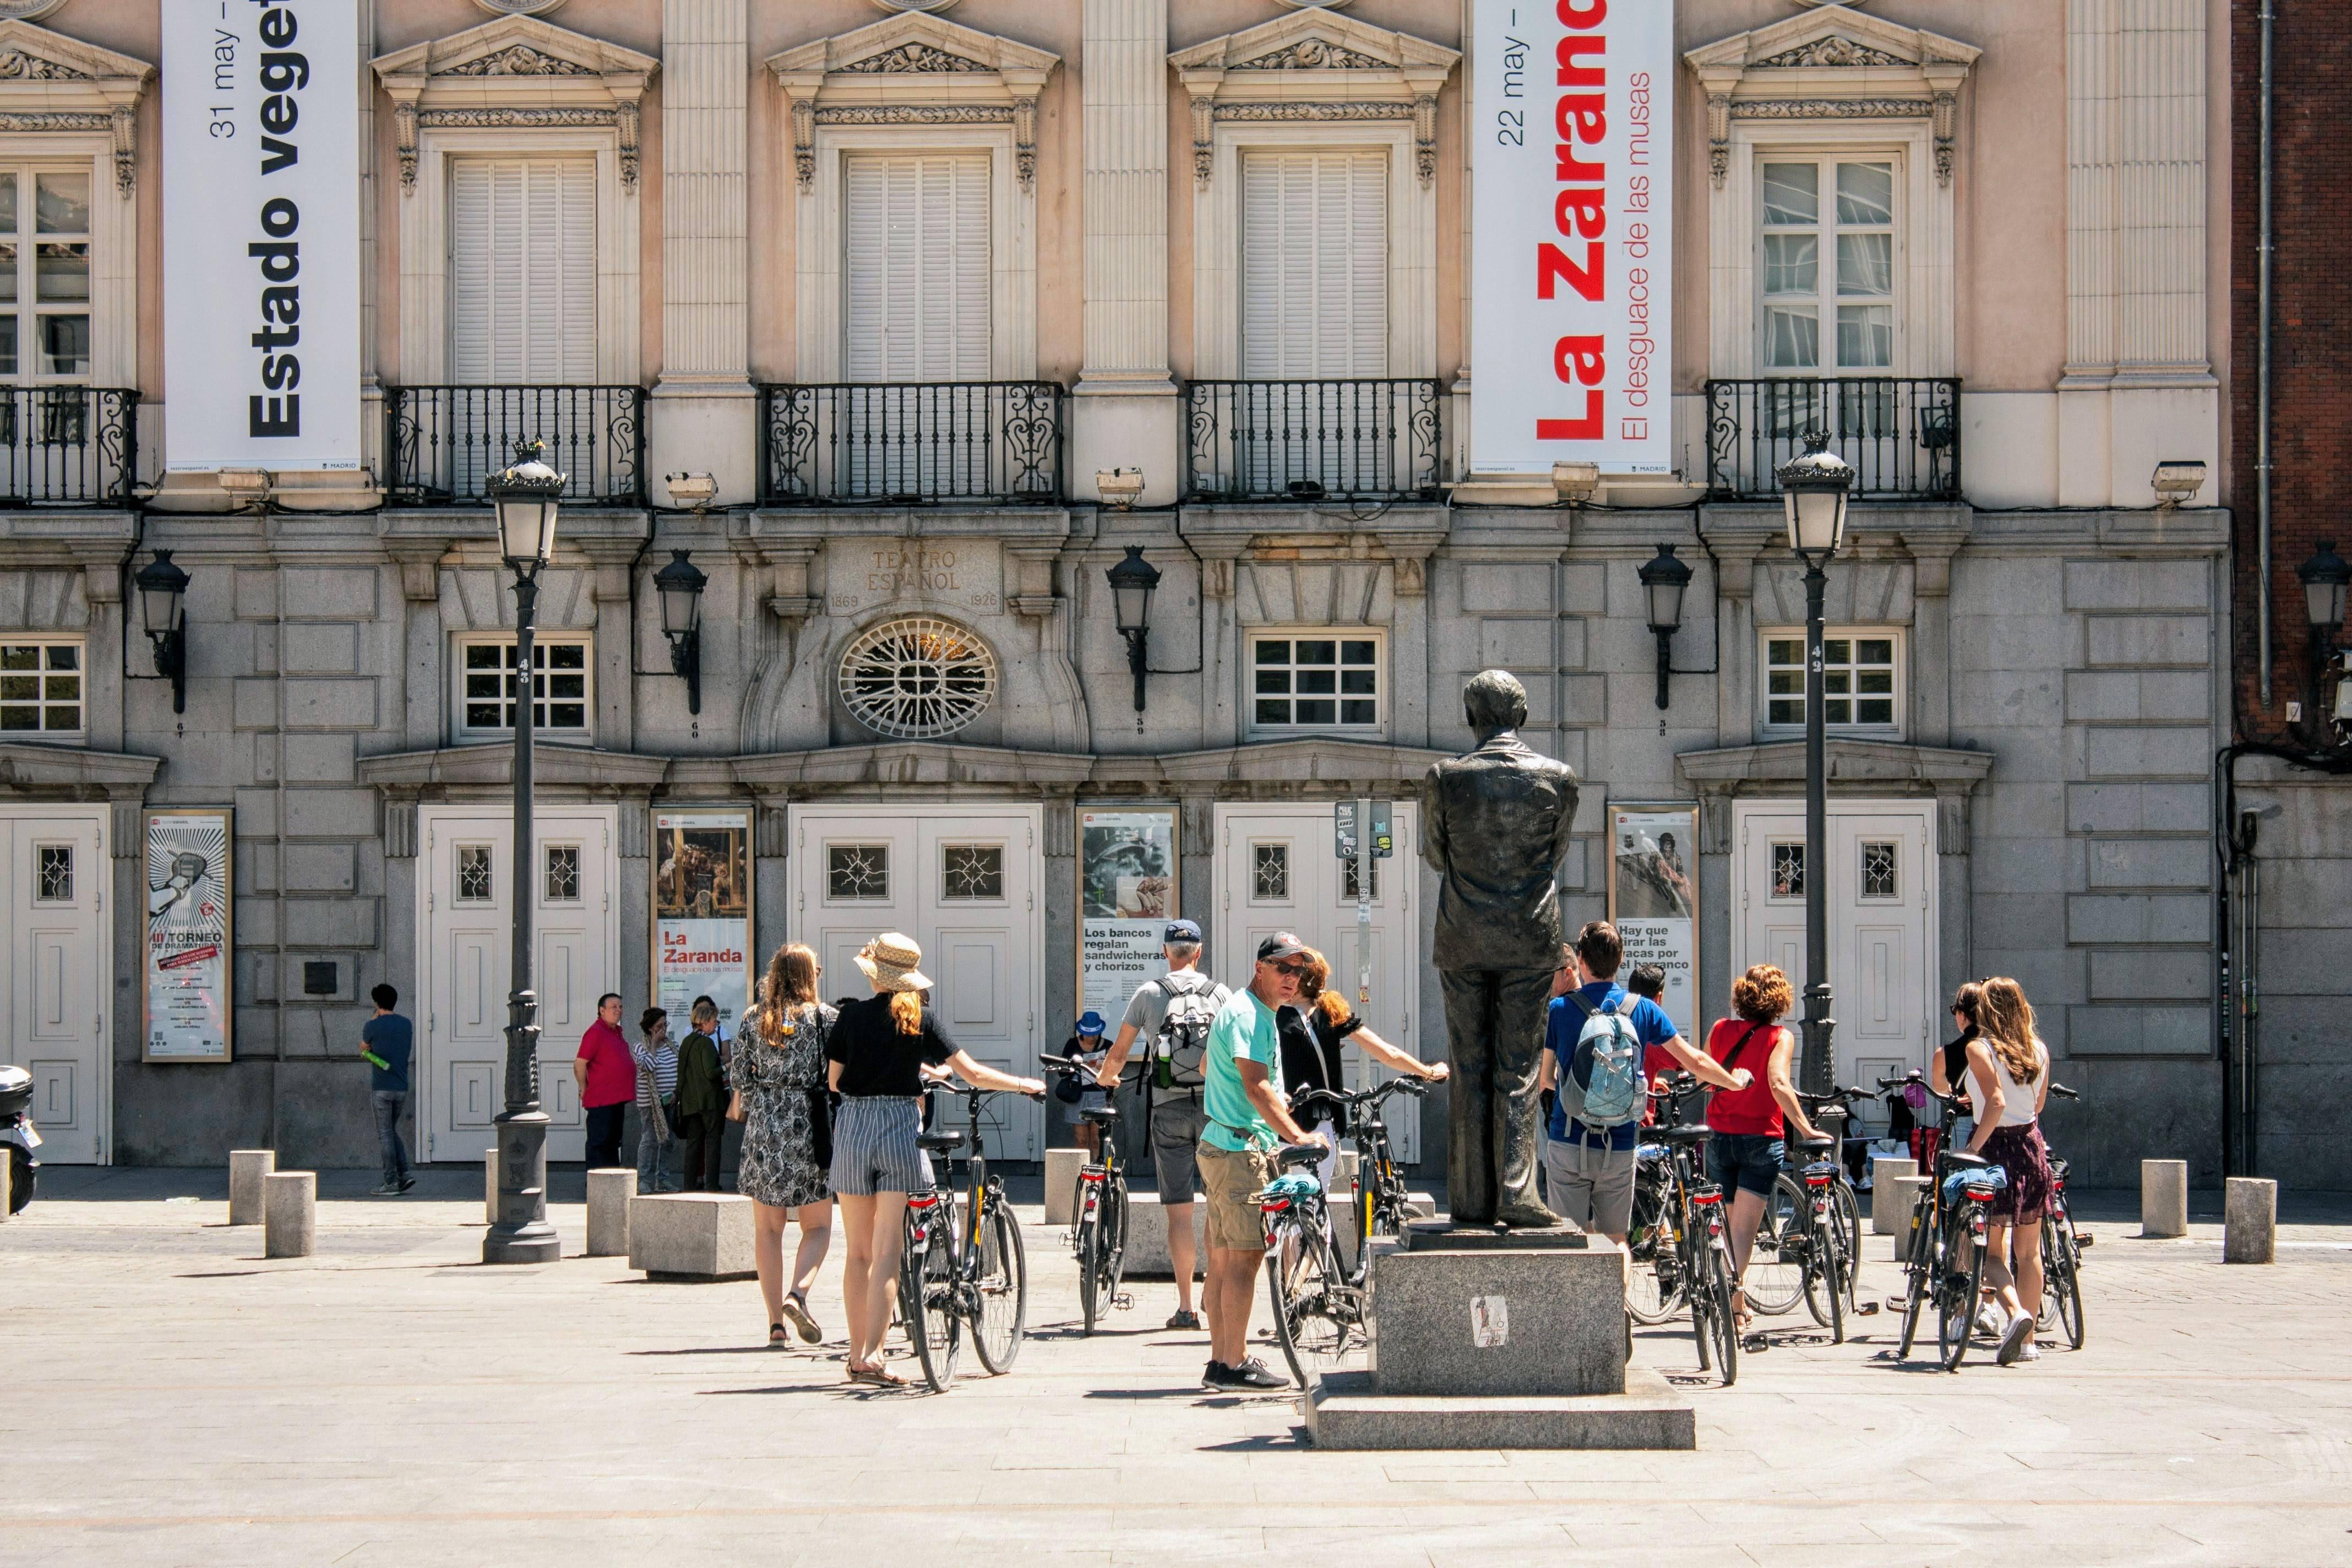 Trixi Madrid Tour de Tapas y Mercados 0020 0008